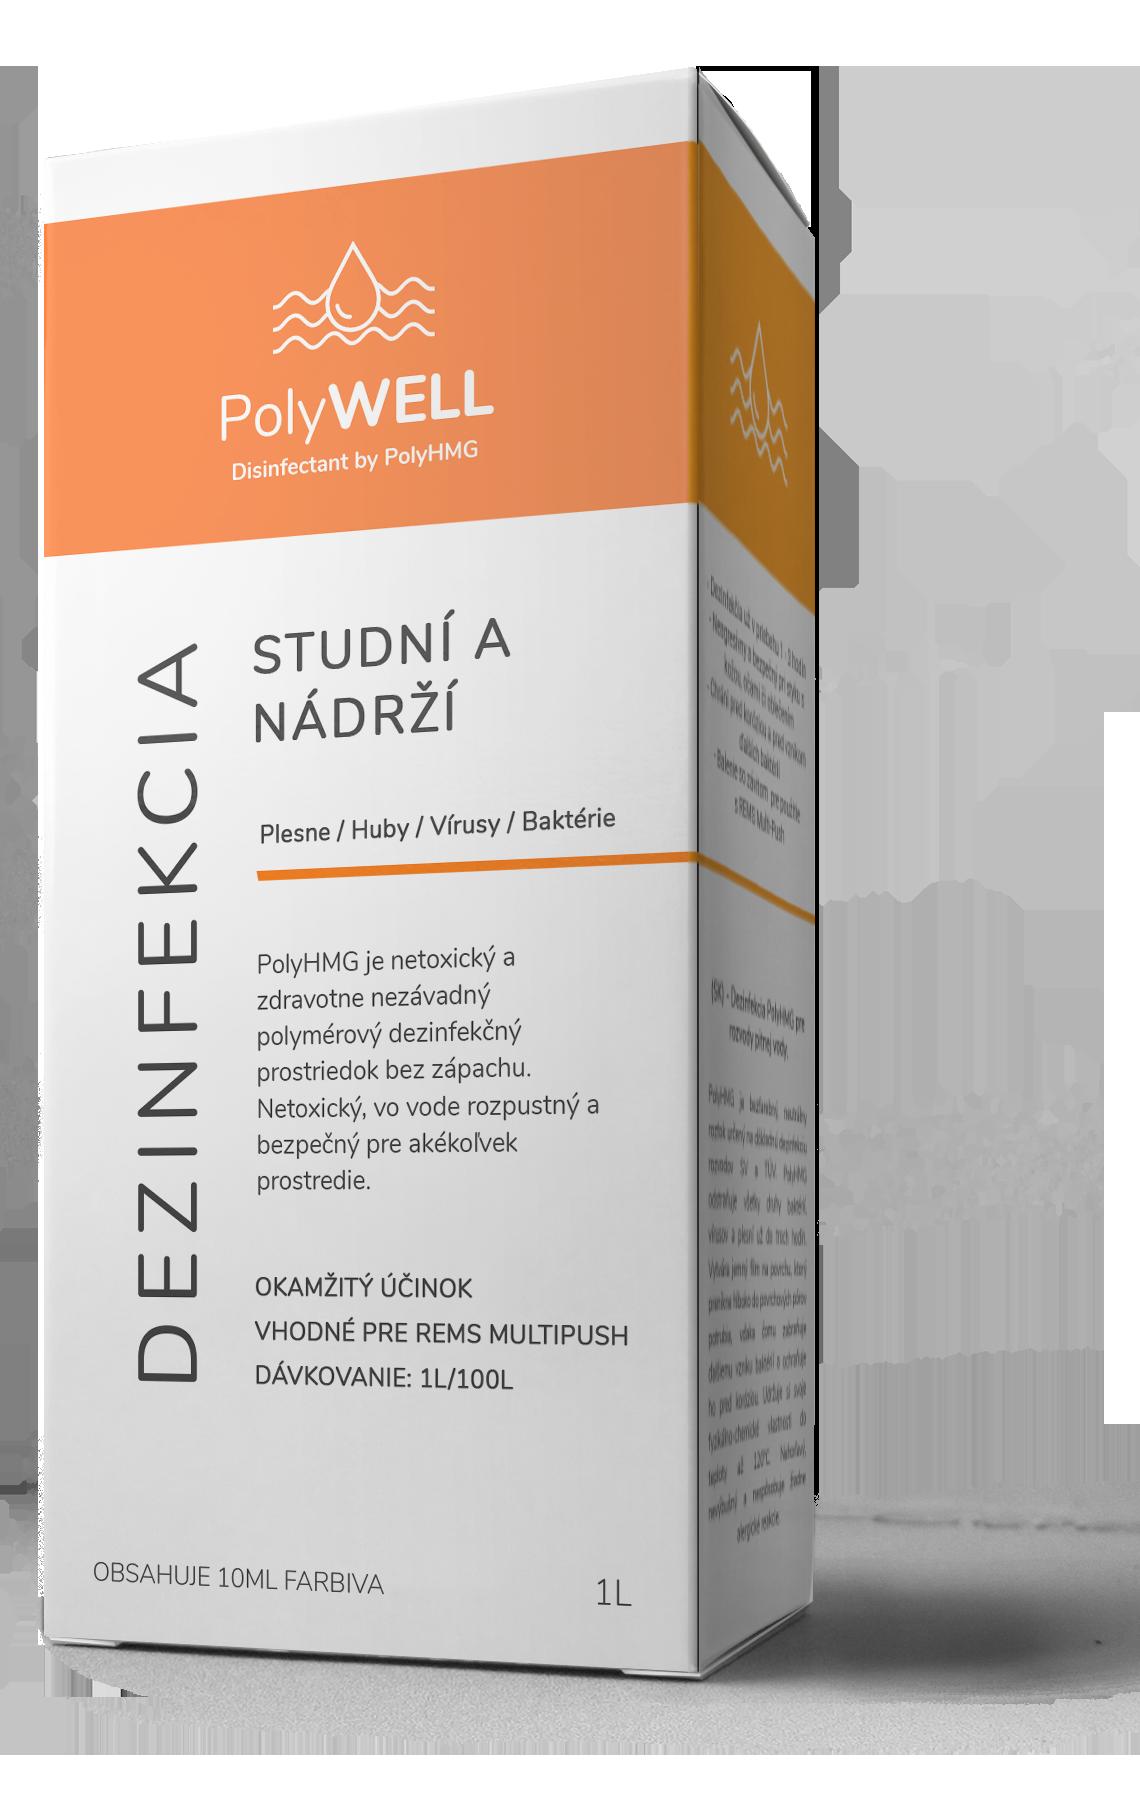 Dezinfekcia PolyHMG - PolyWELL 0,25l